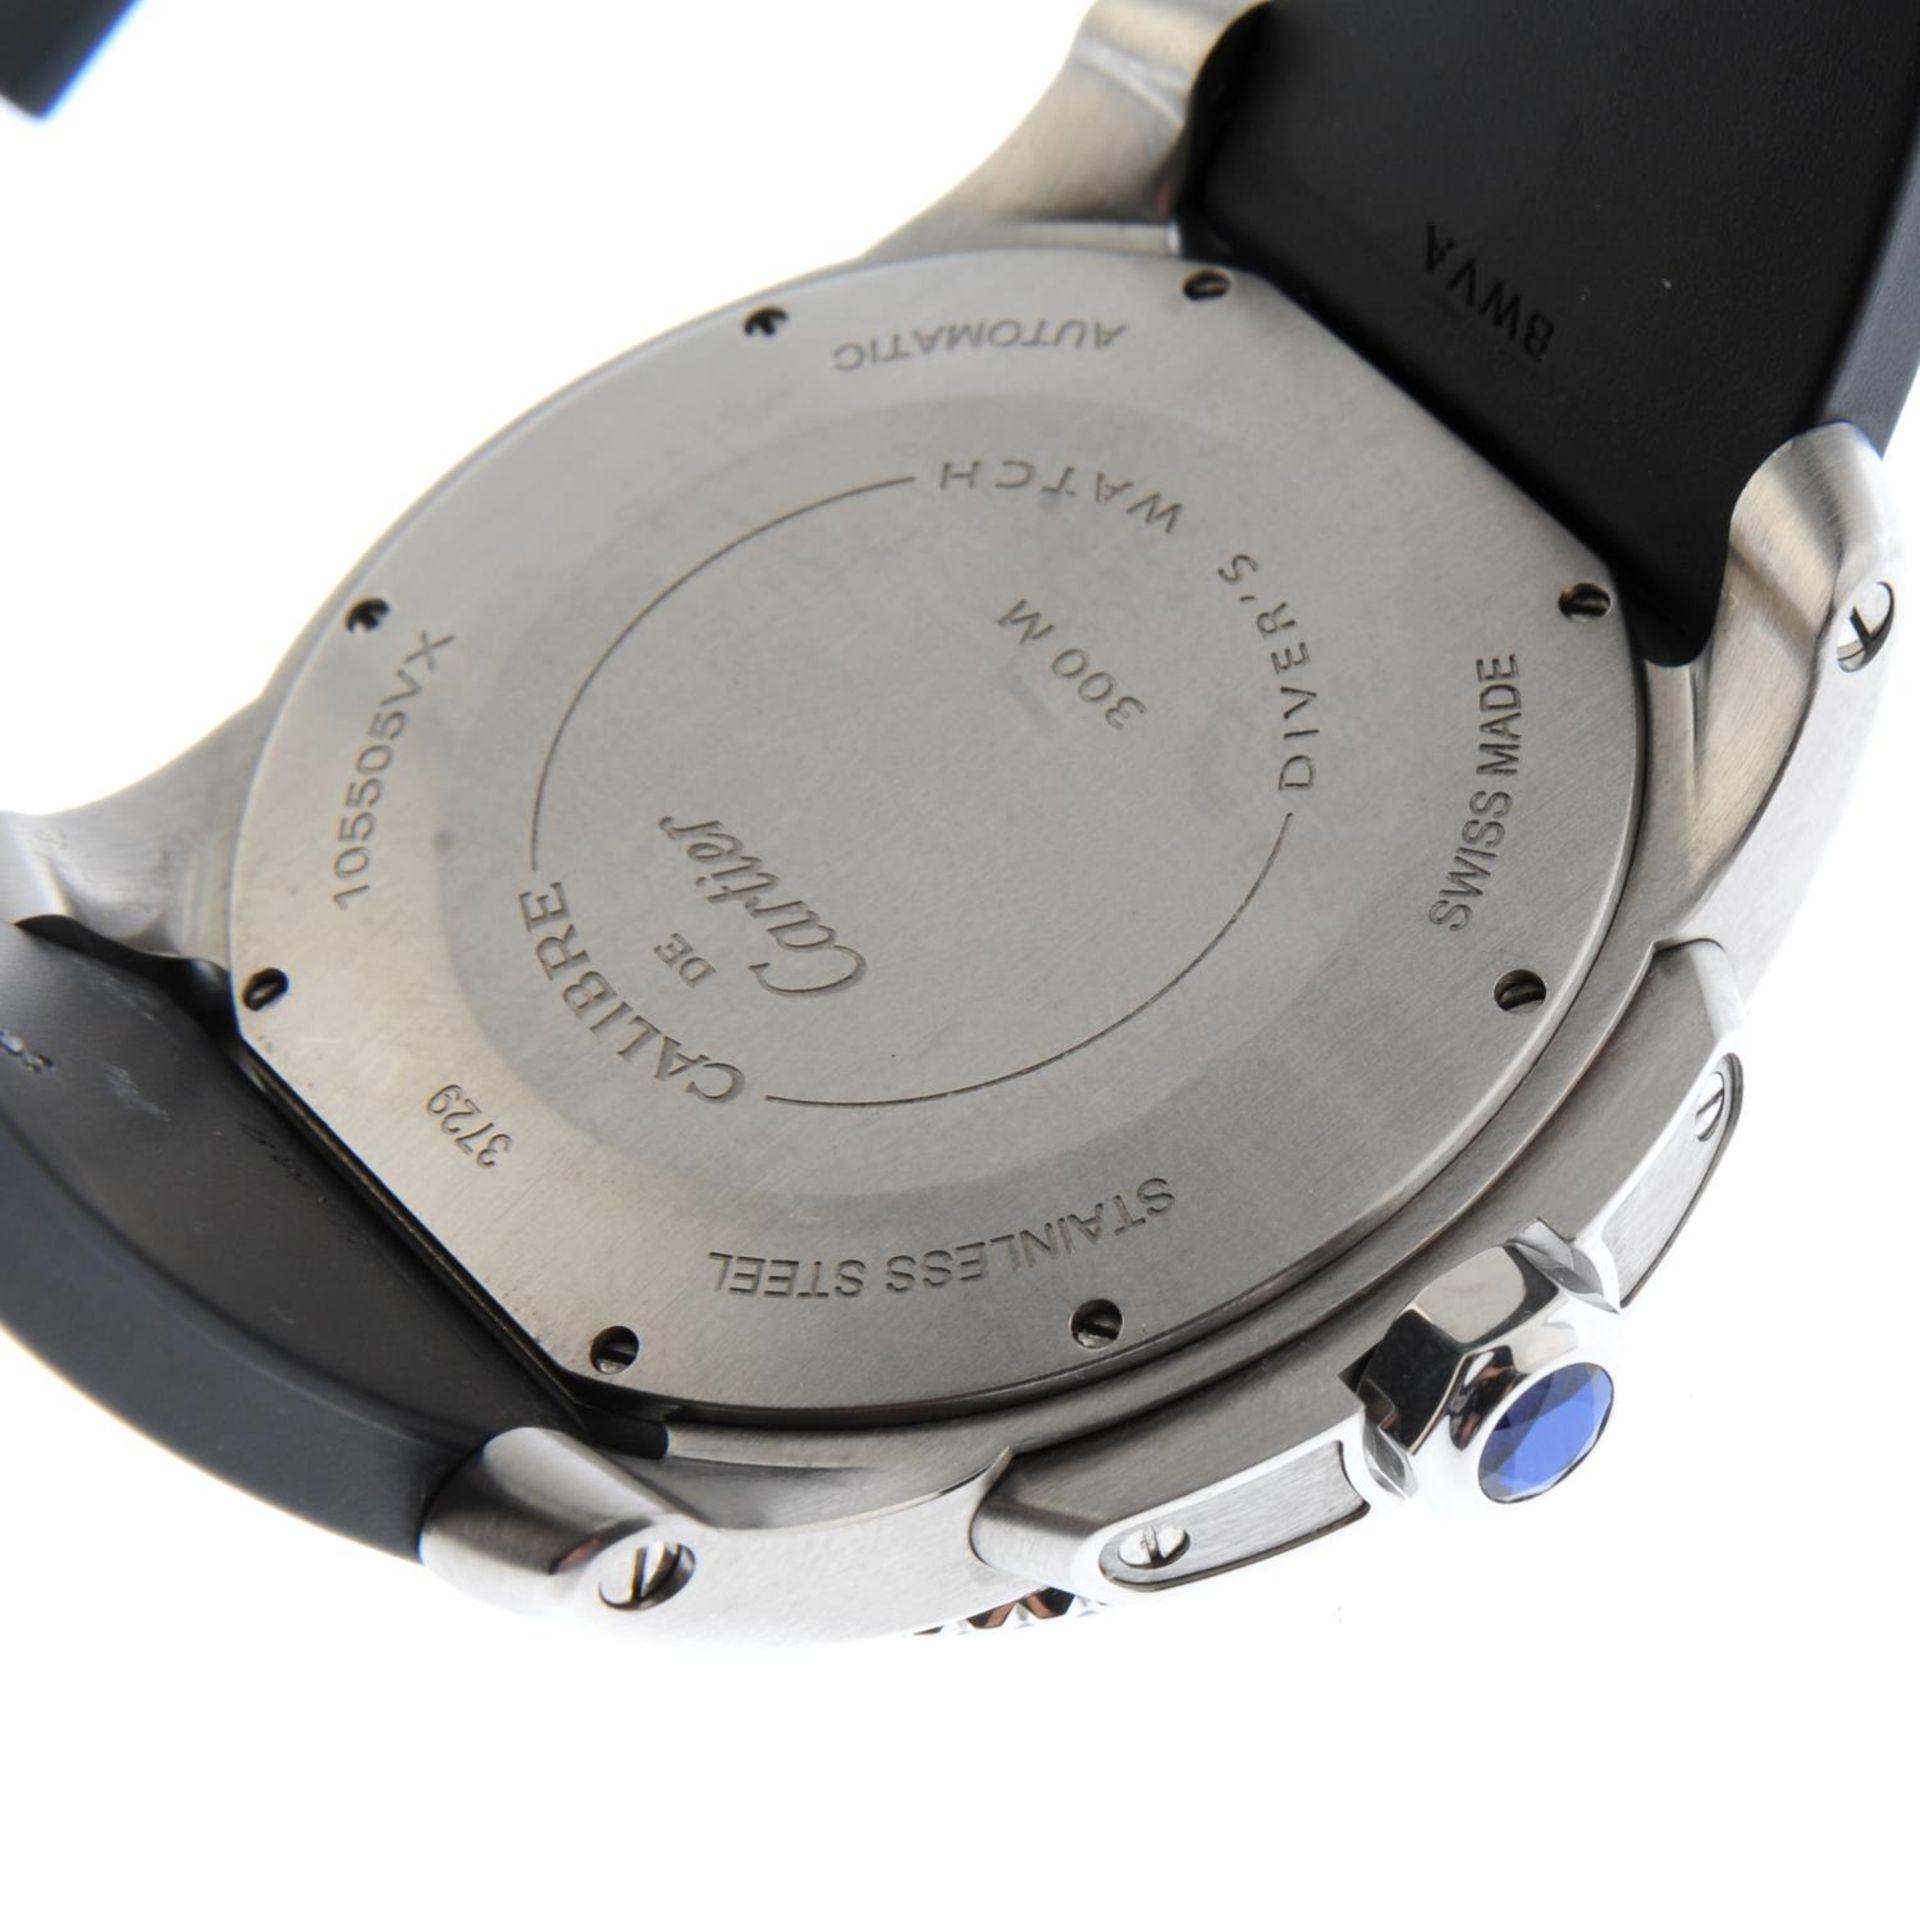 CARTIER - a Calibre de Cartier wrist watch. - Bild 2 aus 6